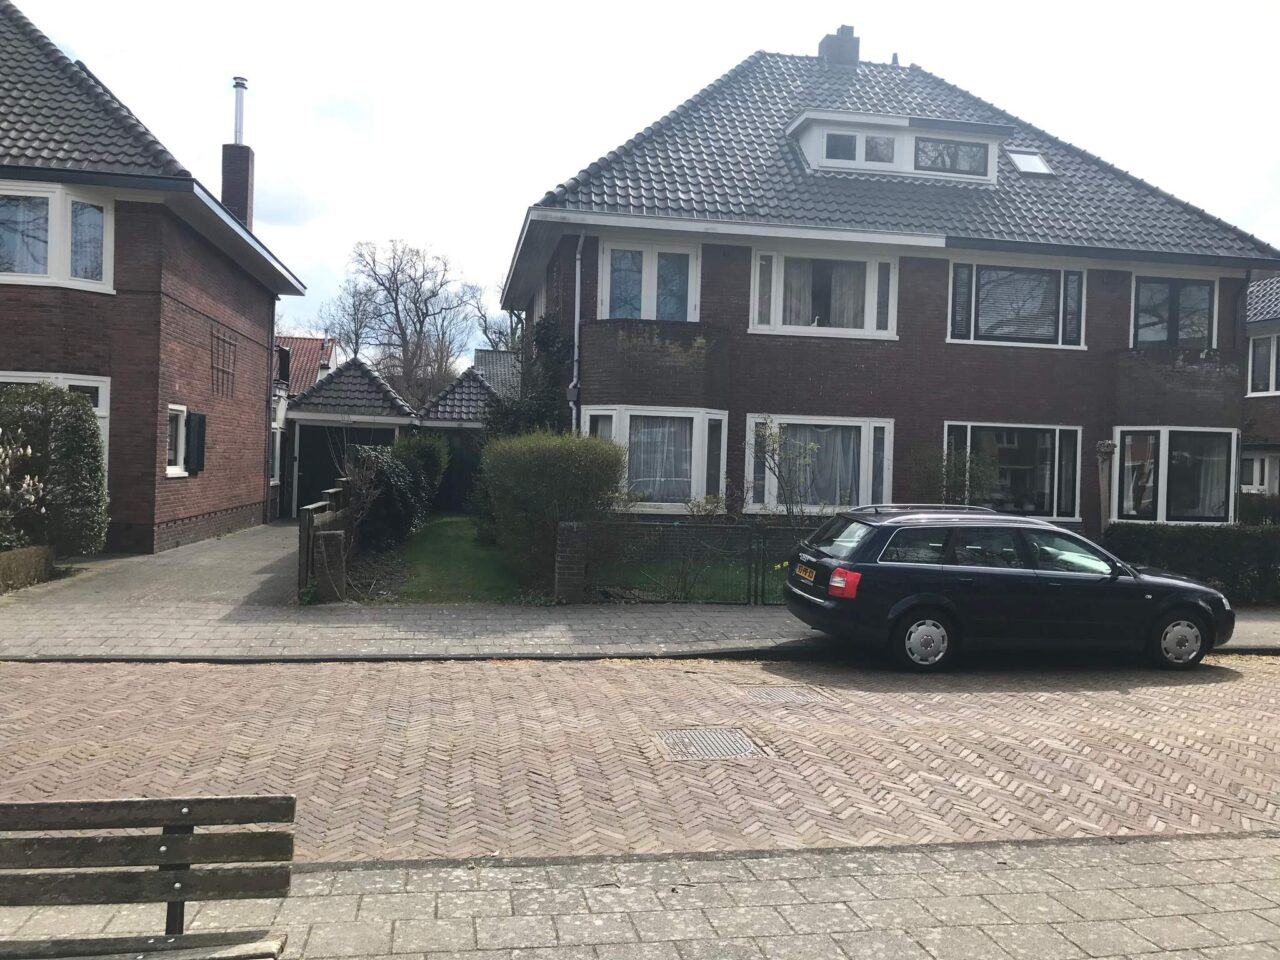 Frederik van Eedenplein 21, Heemstede Heemstede